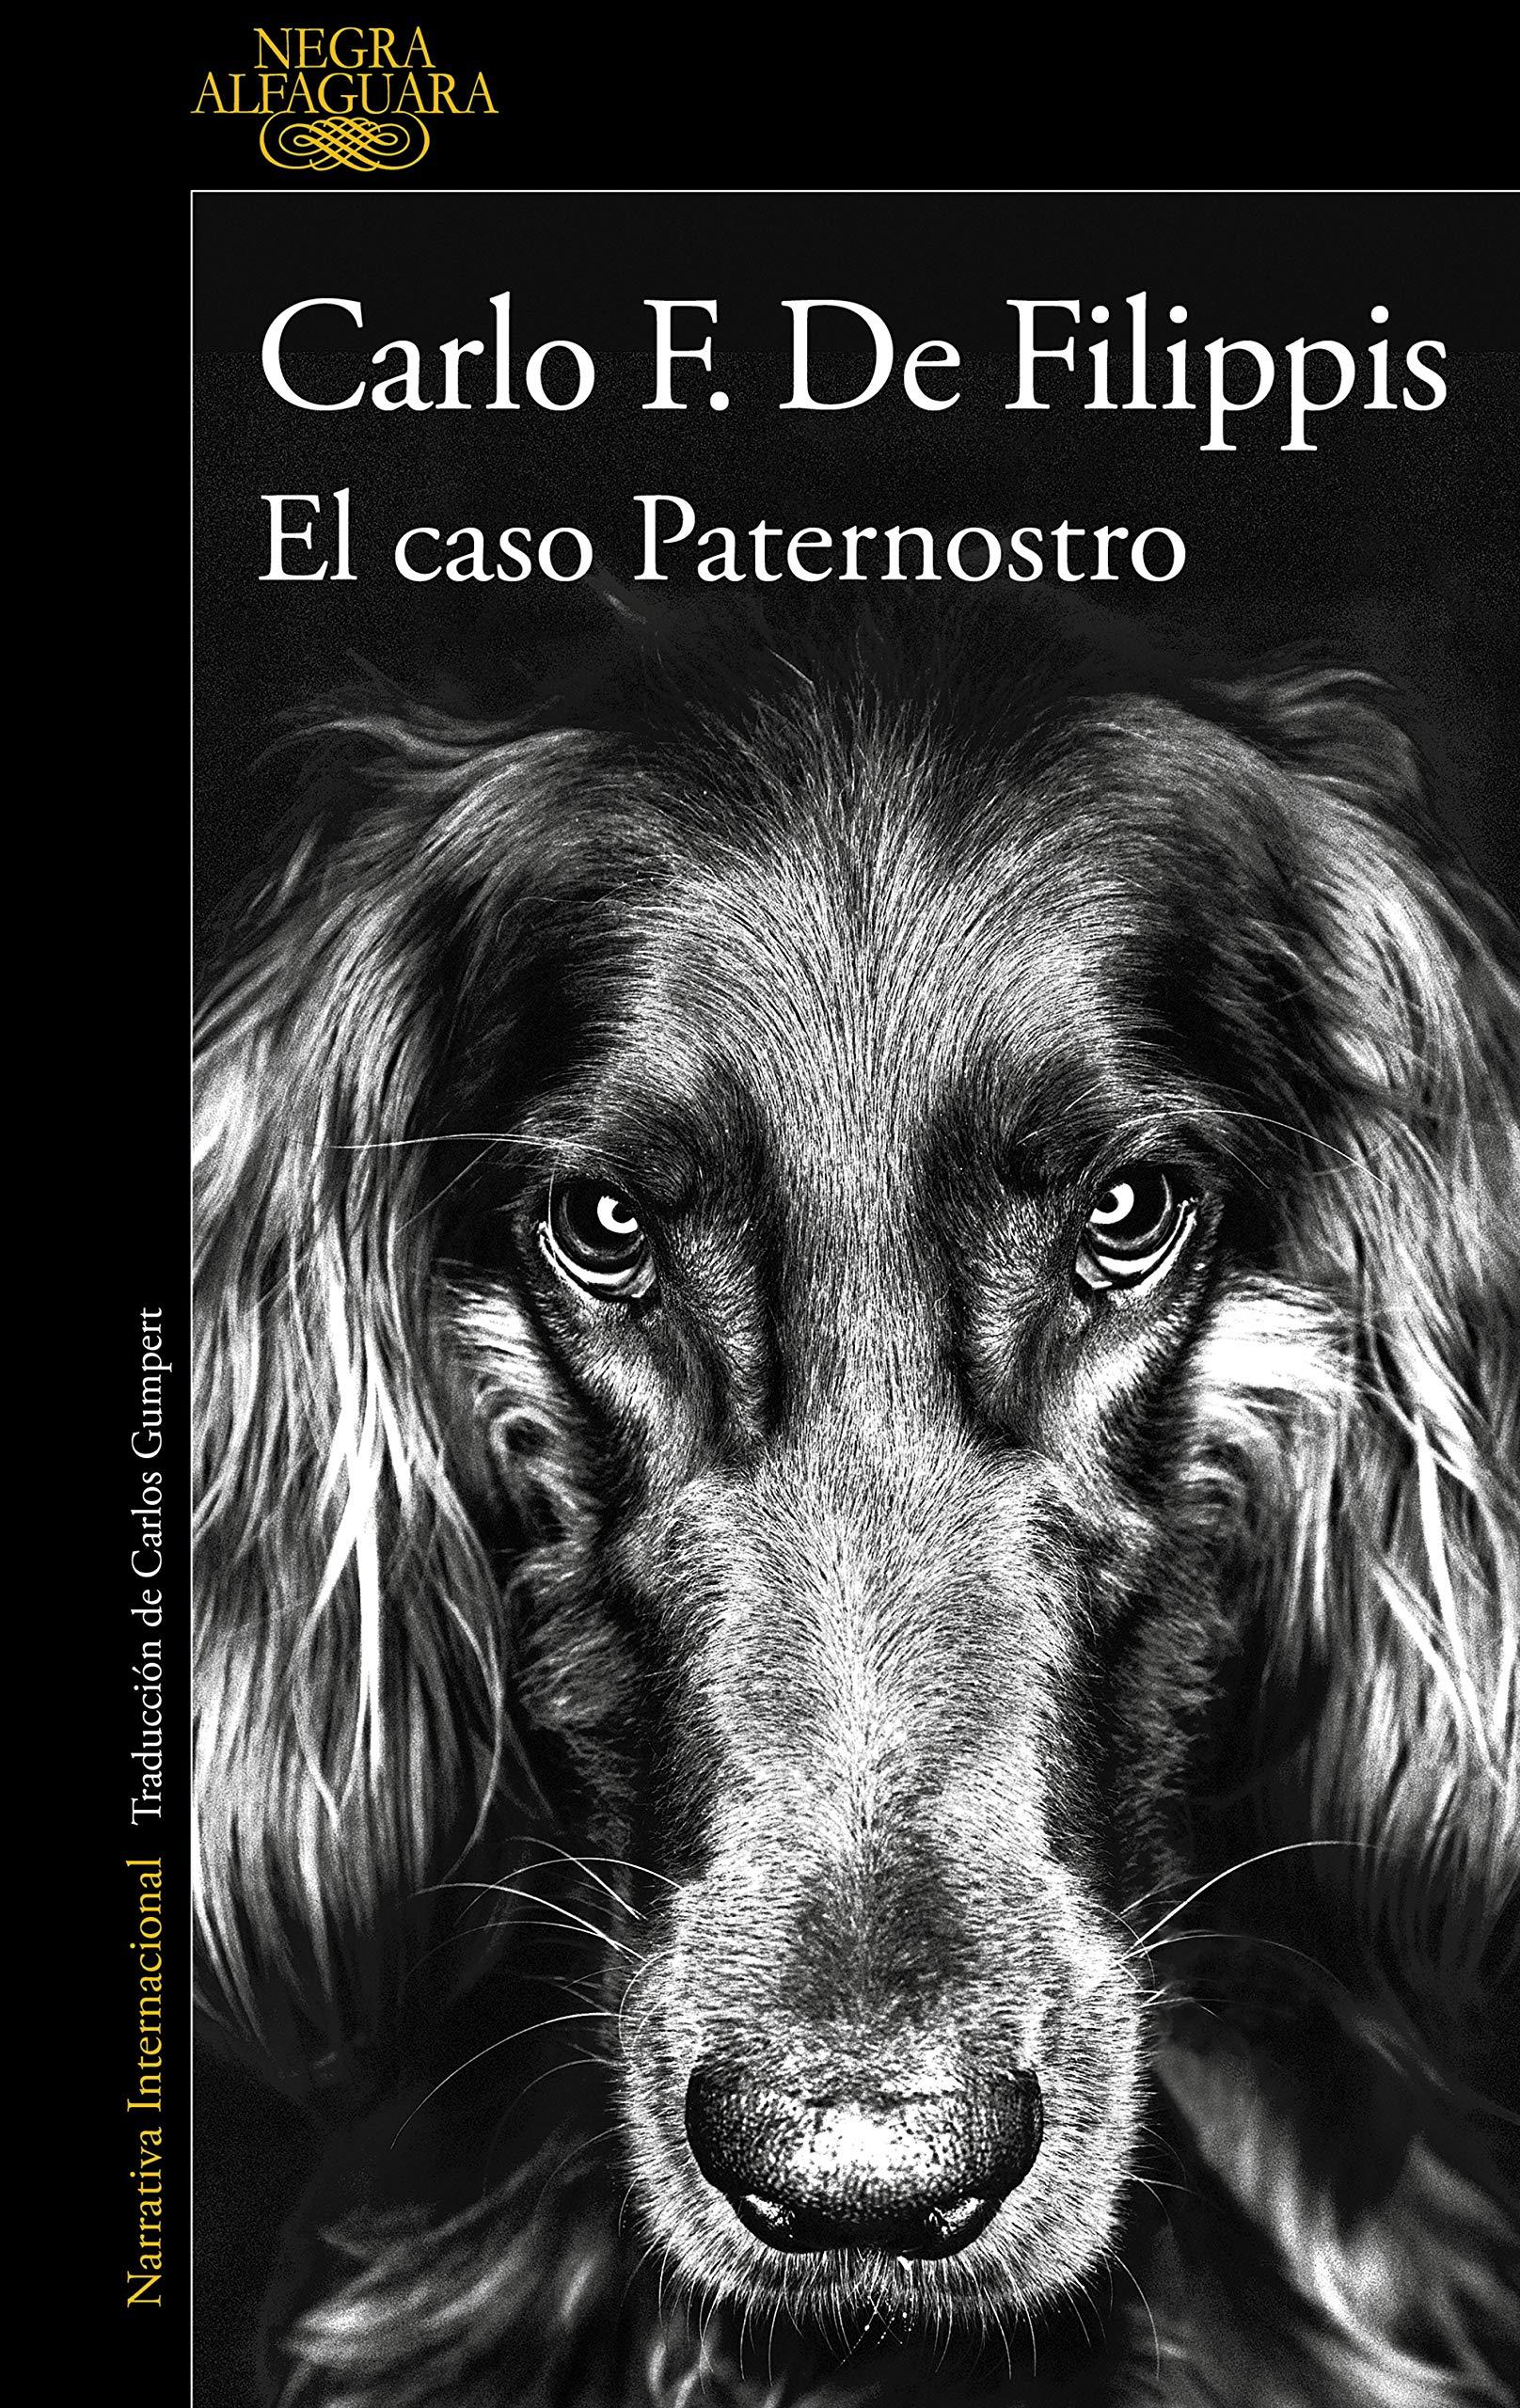 El caso Paternostro (Alfaguara Negra): Amazon.es: De Filippis, Carlo F., Carlos Gumpert Melgosa;: Libros